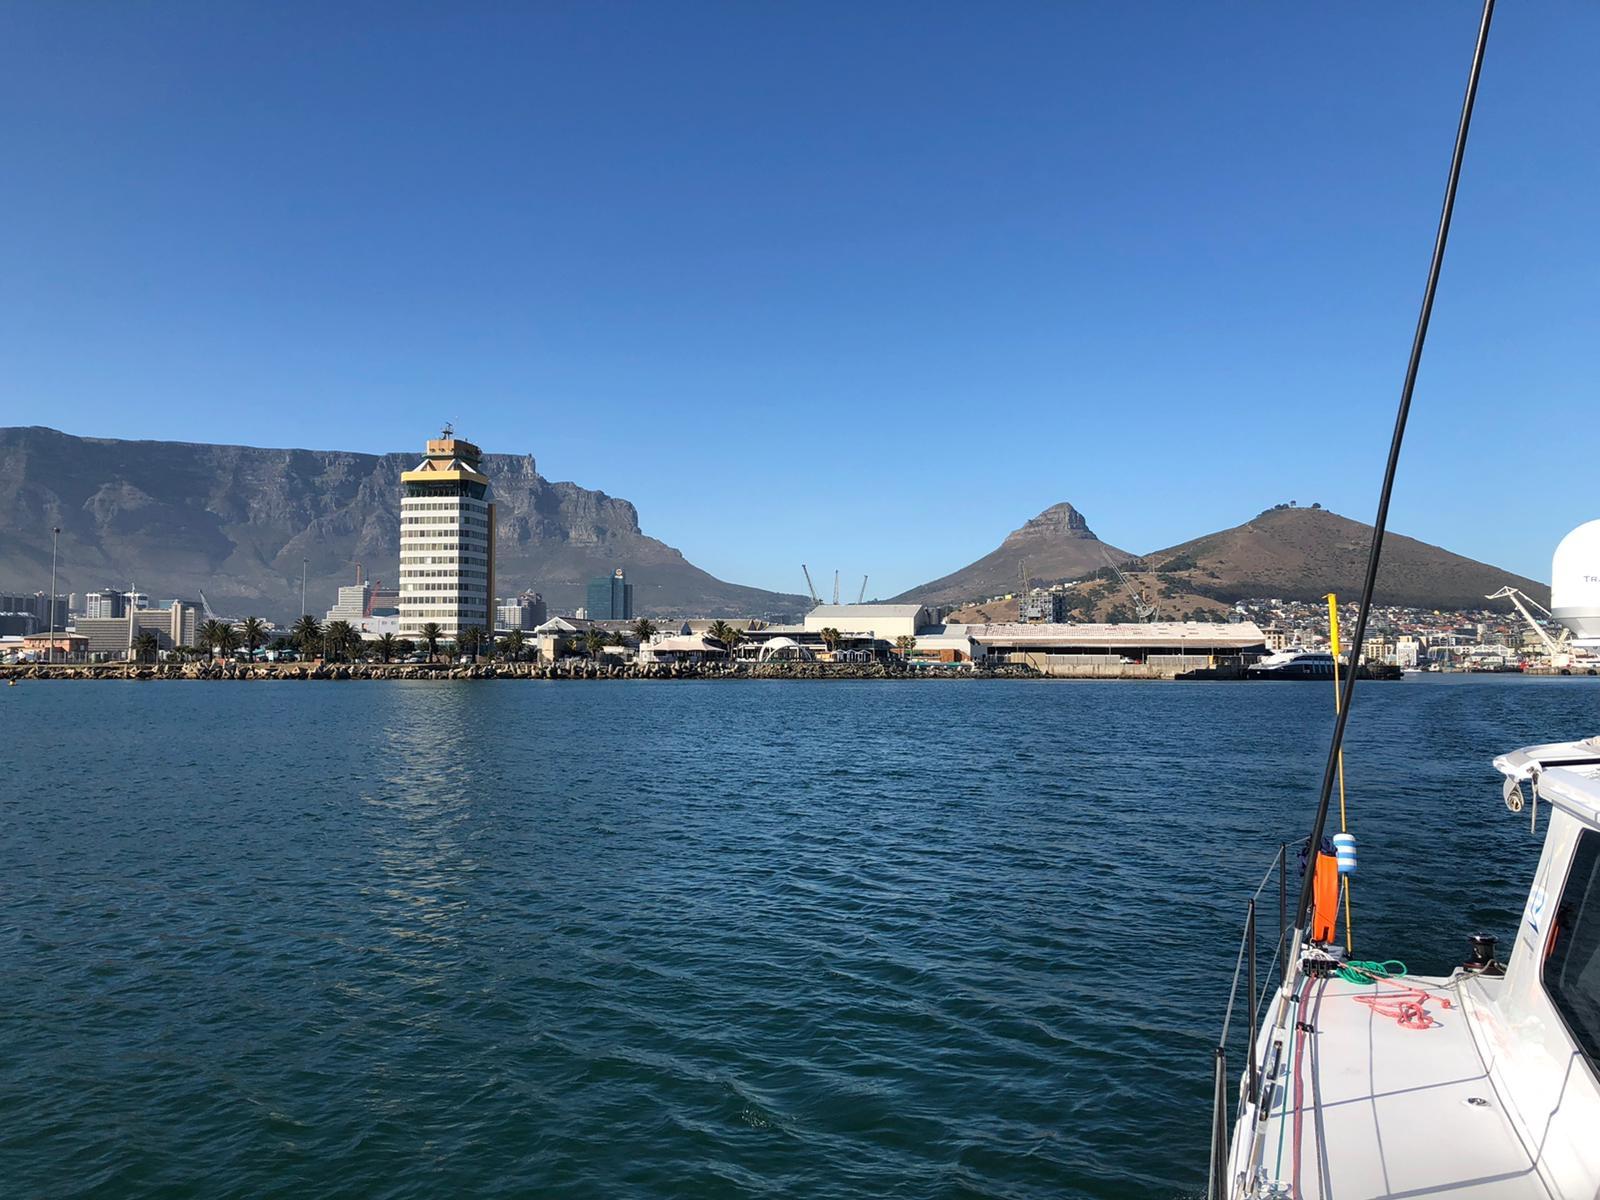 Goodbye Cape Town